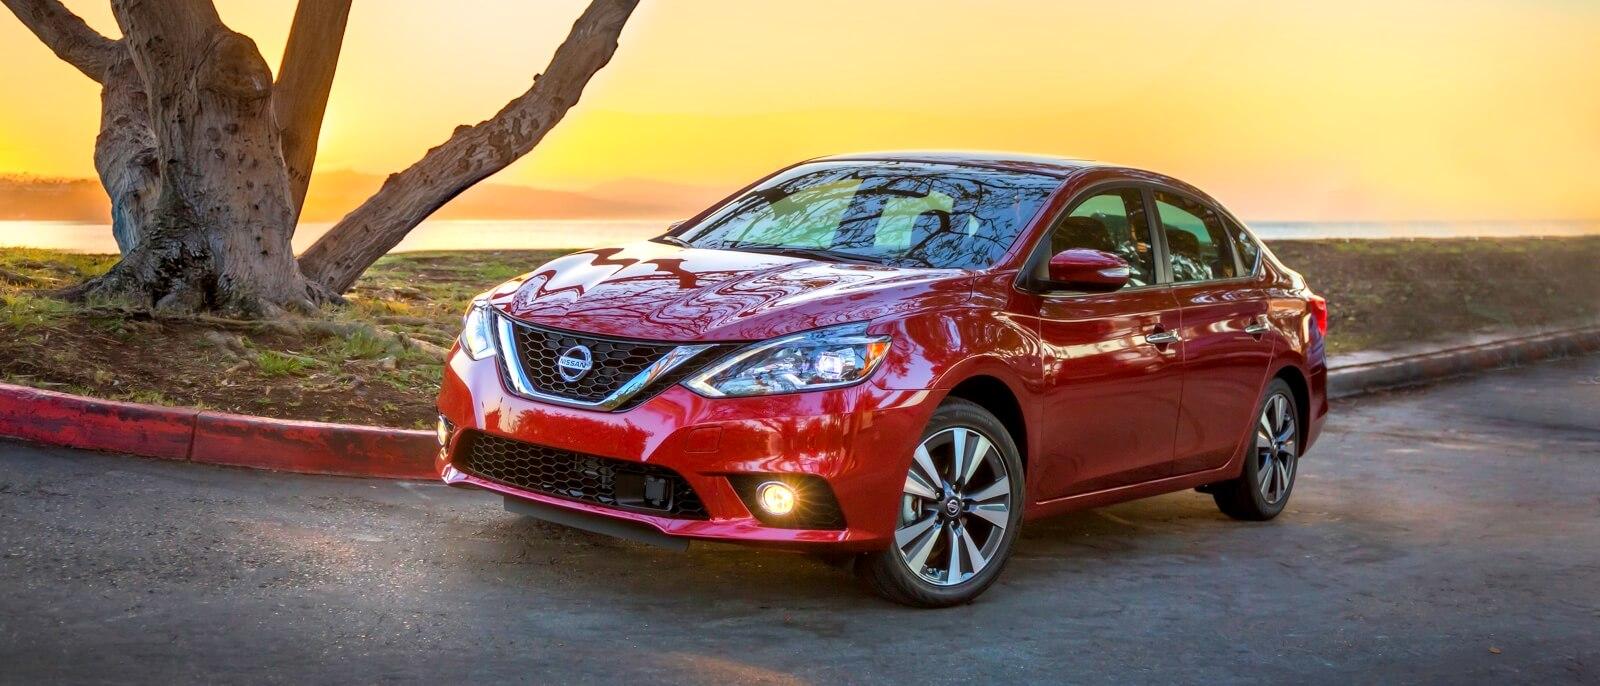 2016 Nissan Sentra red exterior